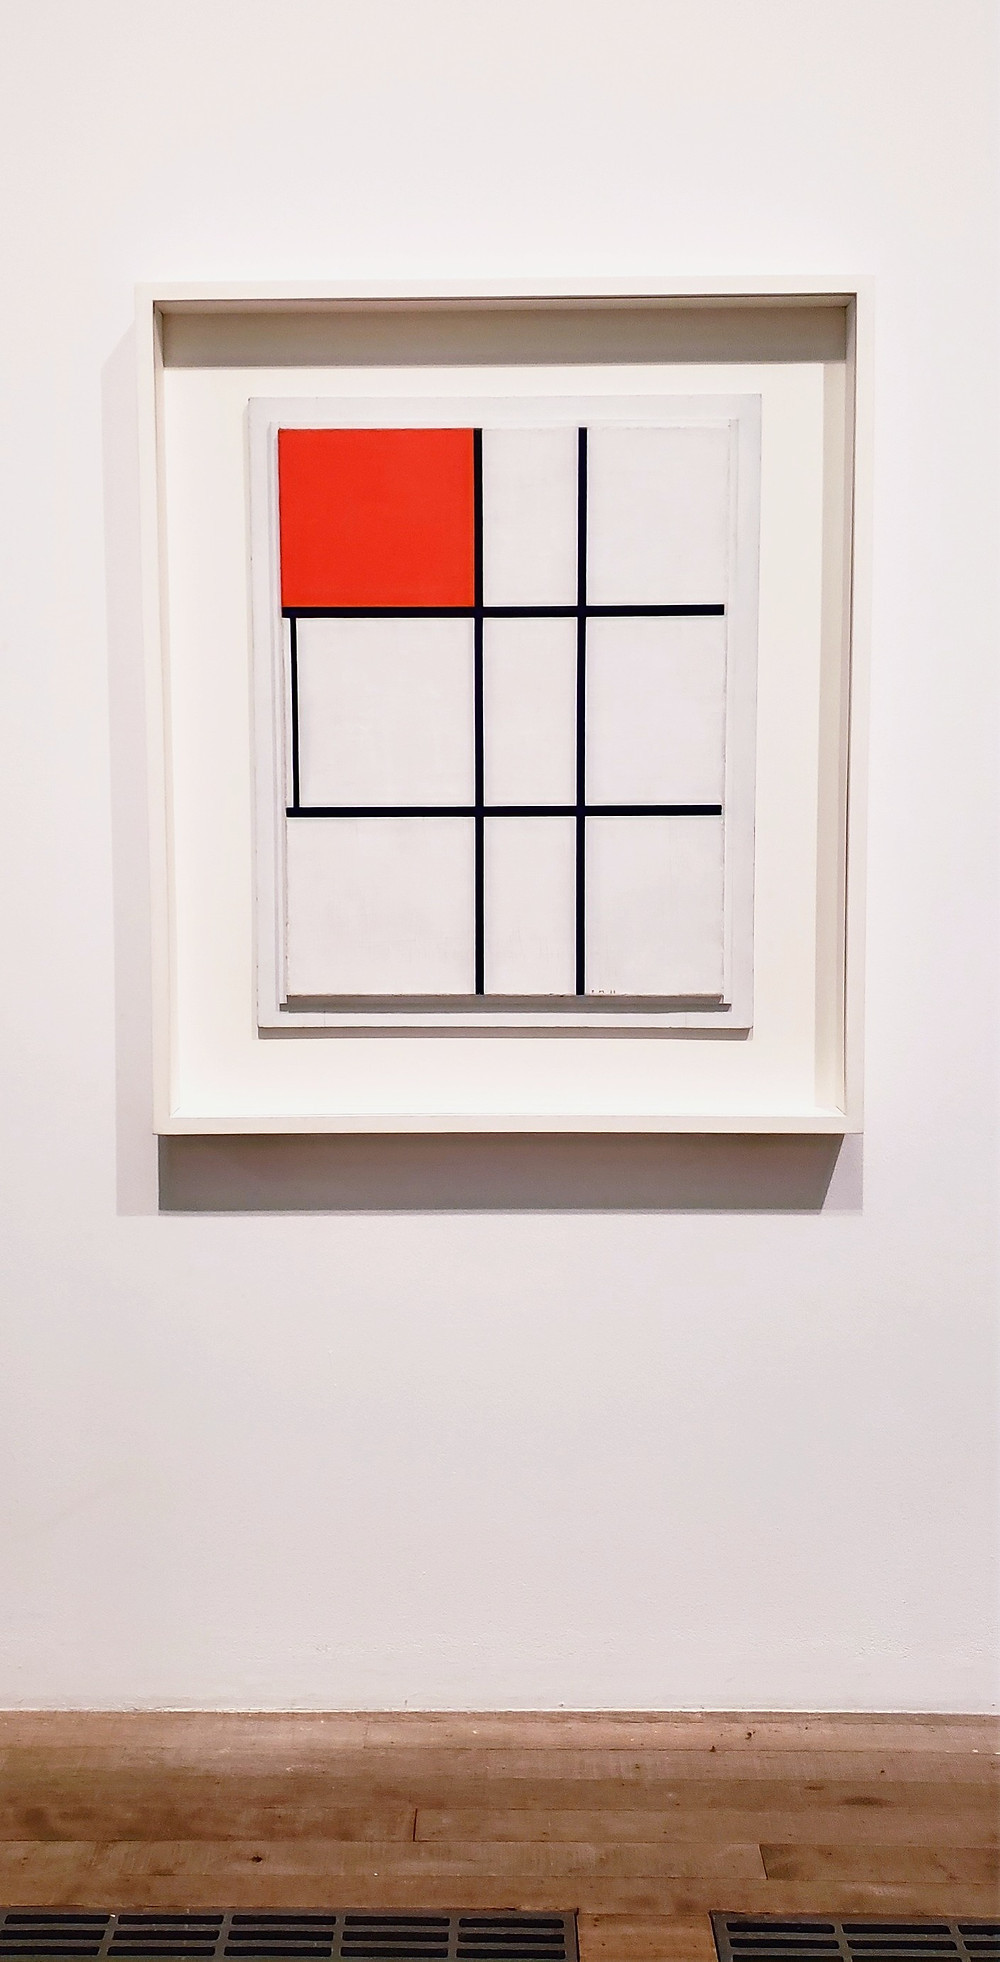 square grid red box art portrait